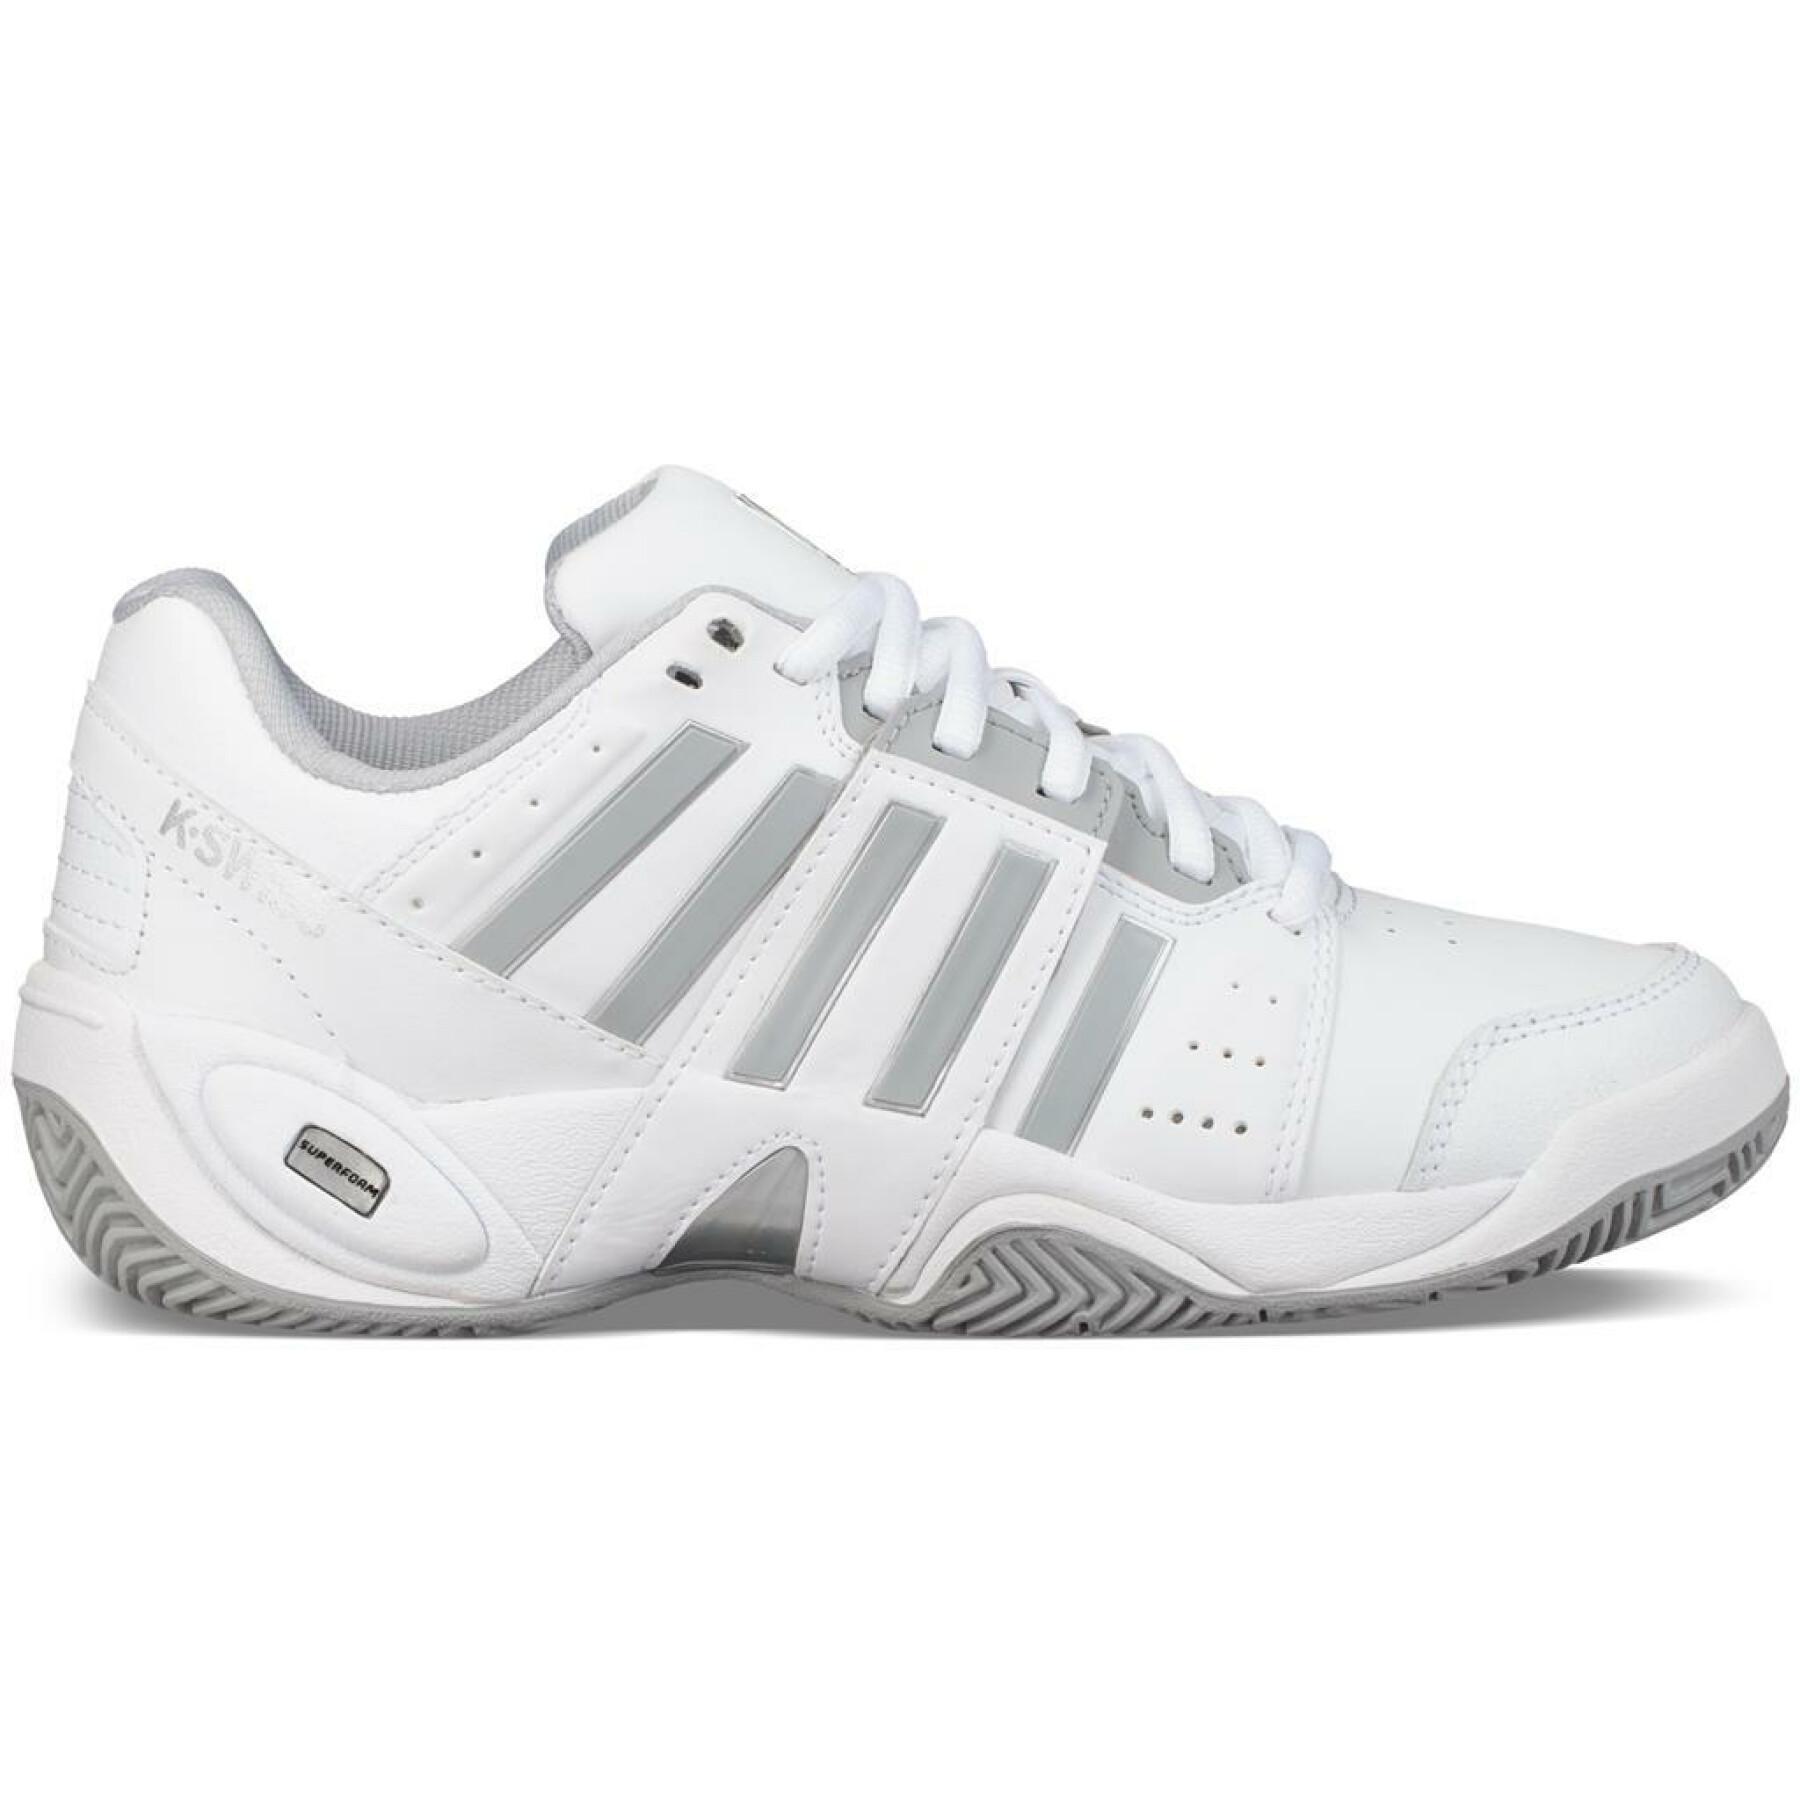 Women's shoes K-Swiss accomplish 3